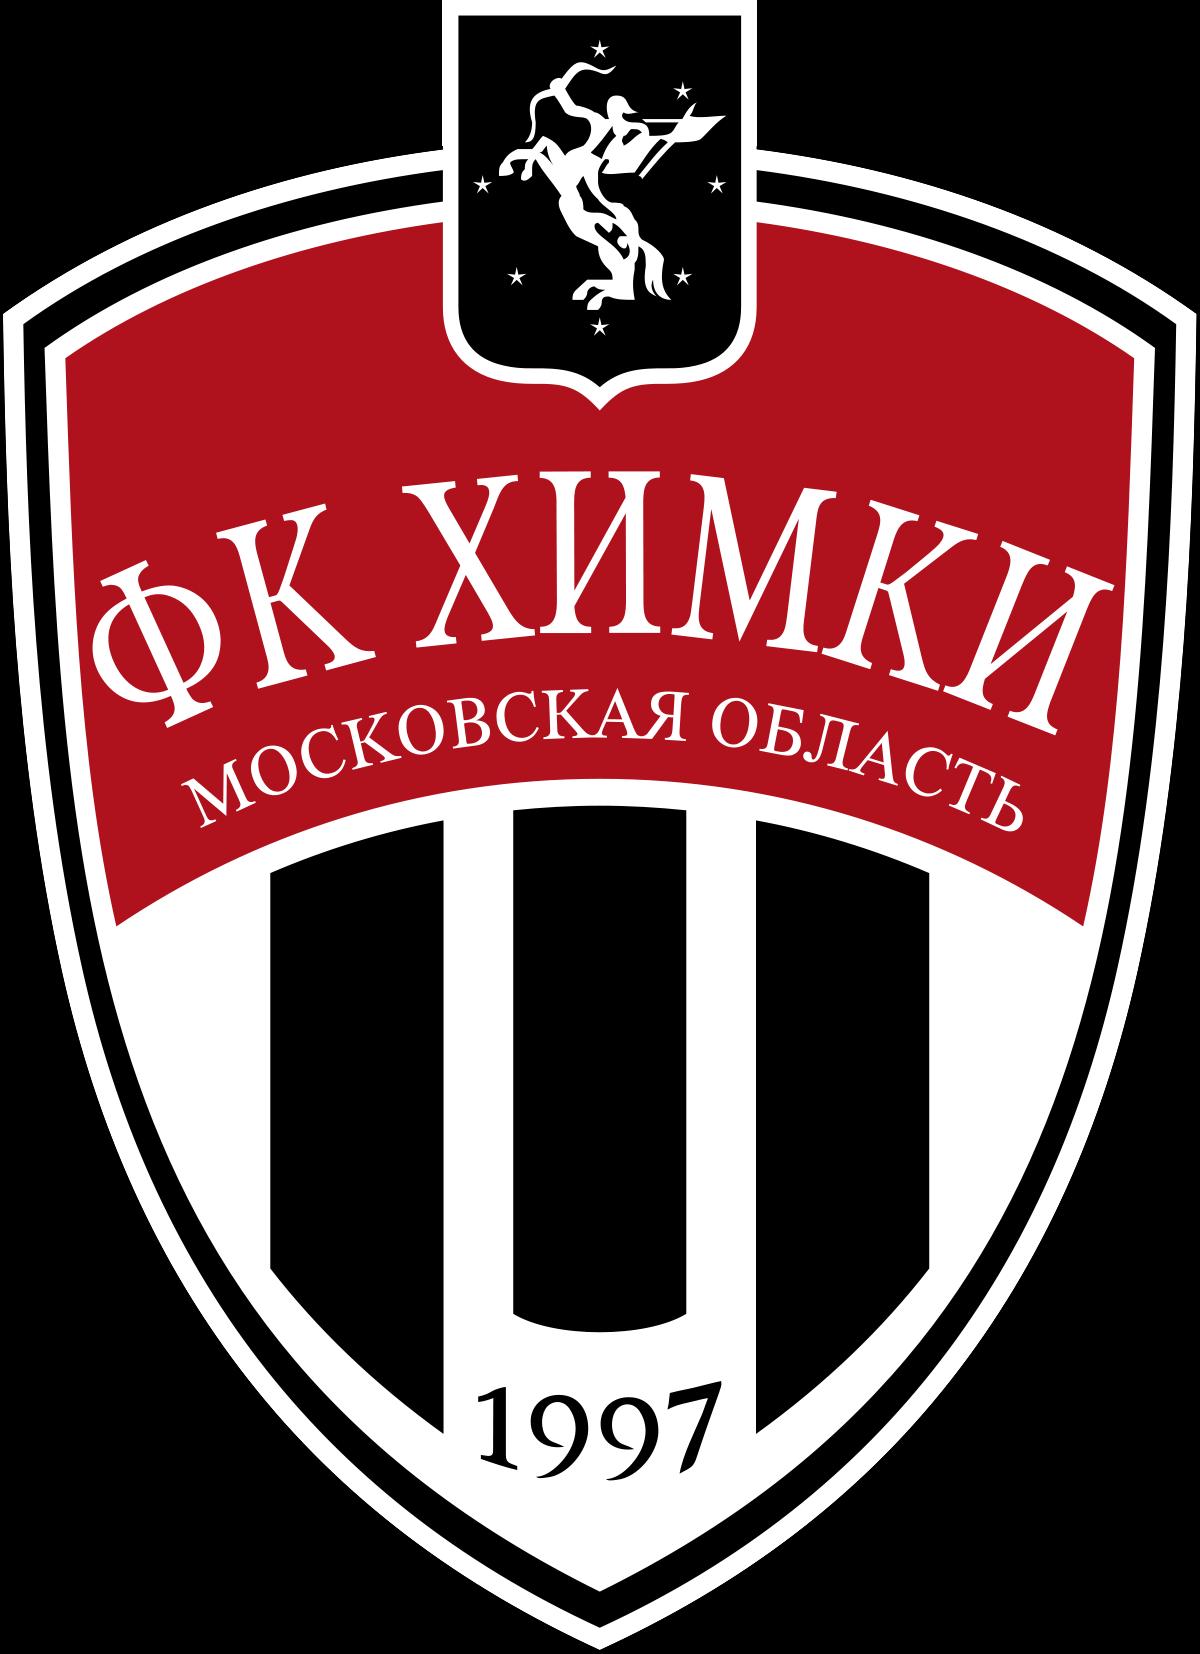 Khimki логотип